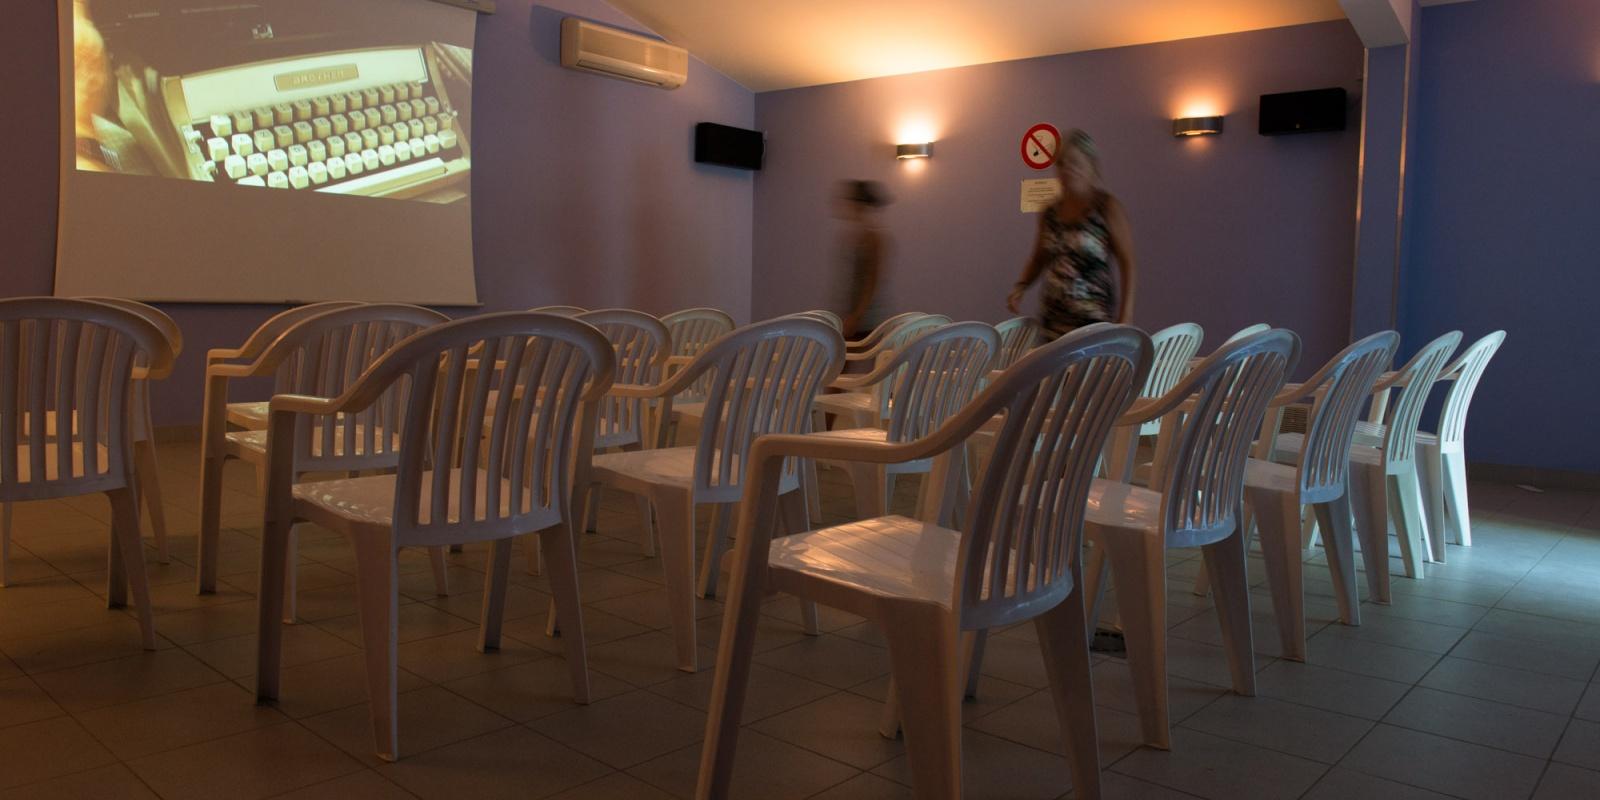 Camping familial camargue vos vacances pleines d 39 animations - Home cinema que choisir ...